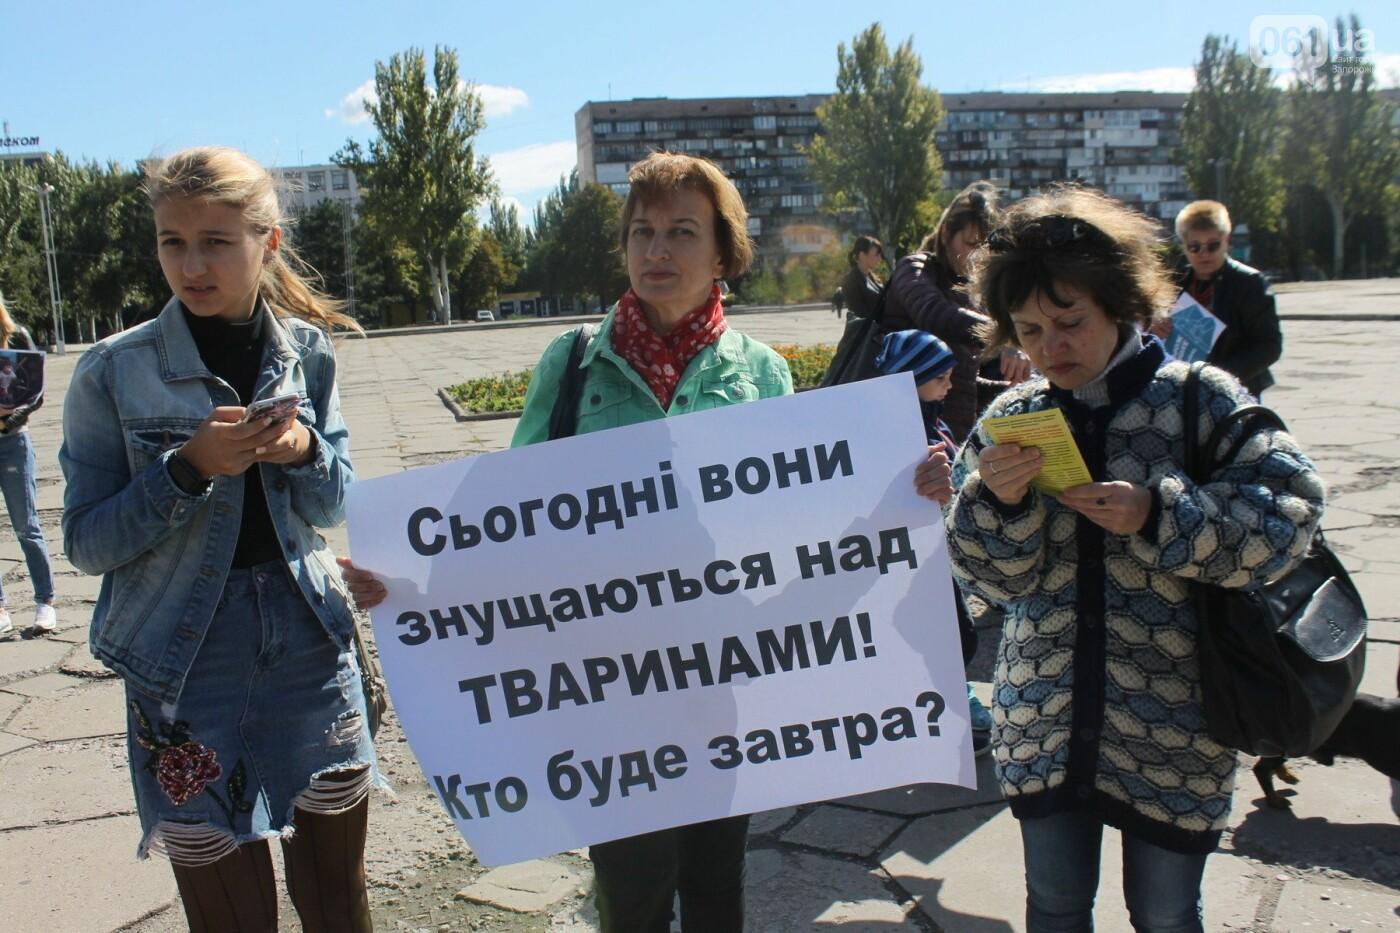 «Защити! Не мучай»: в Запорожье провели марш за права животных, – ФОТОРЕПОРТАЖ, ВИДЕО, фото-11